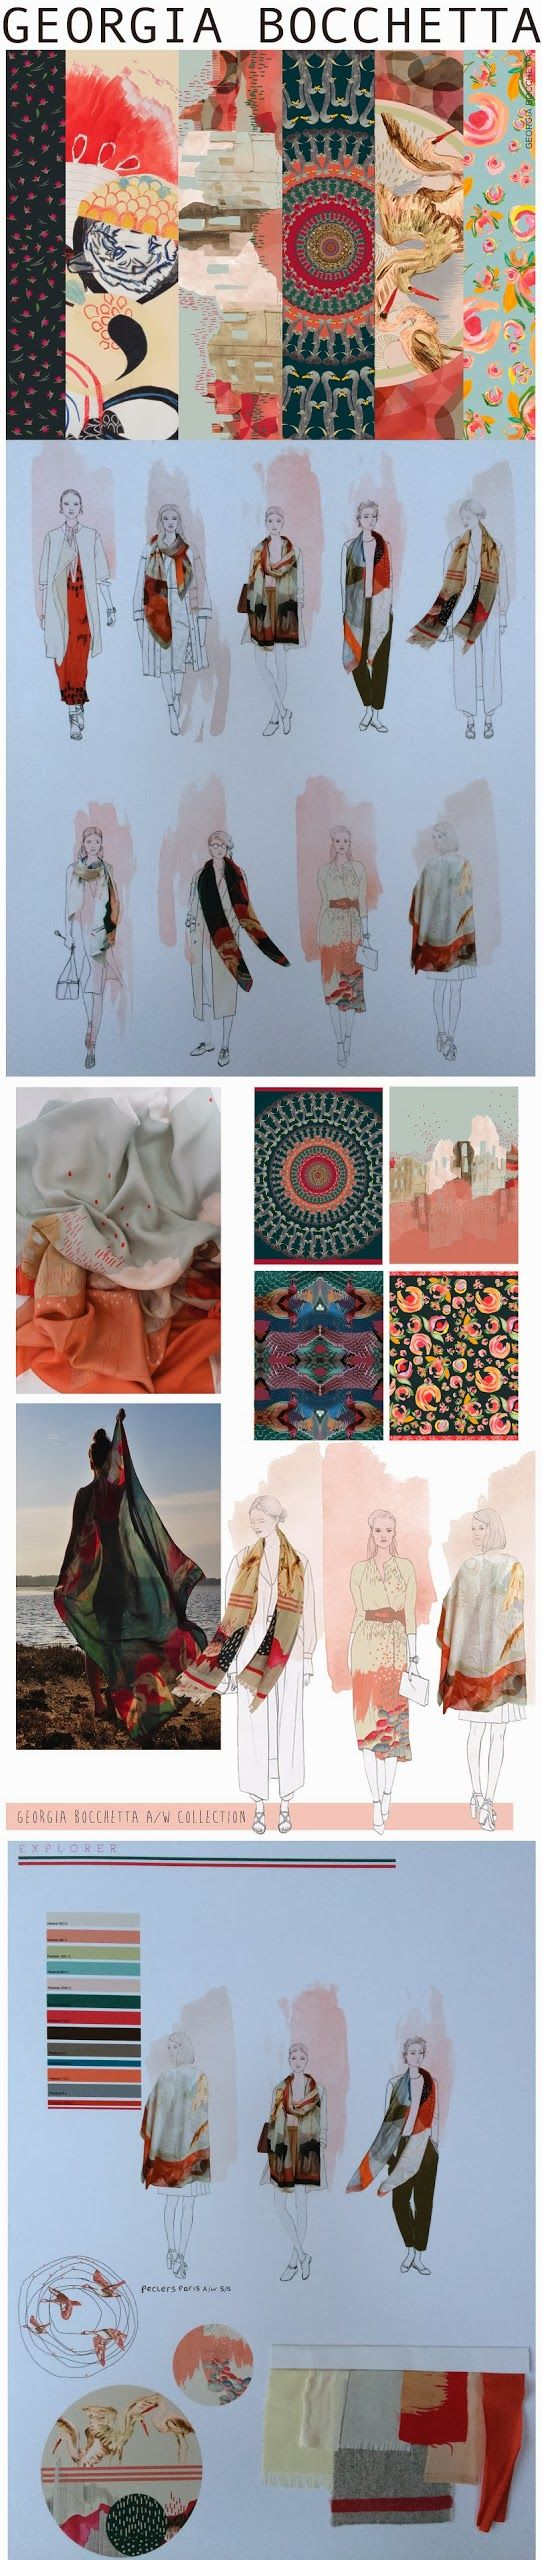 Fashion Portfolio - textiles print & pattern design development - fashion sketchbook; fashion illustration by Georgia Bocchetta.